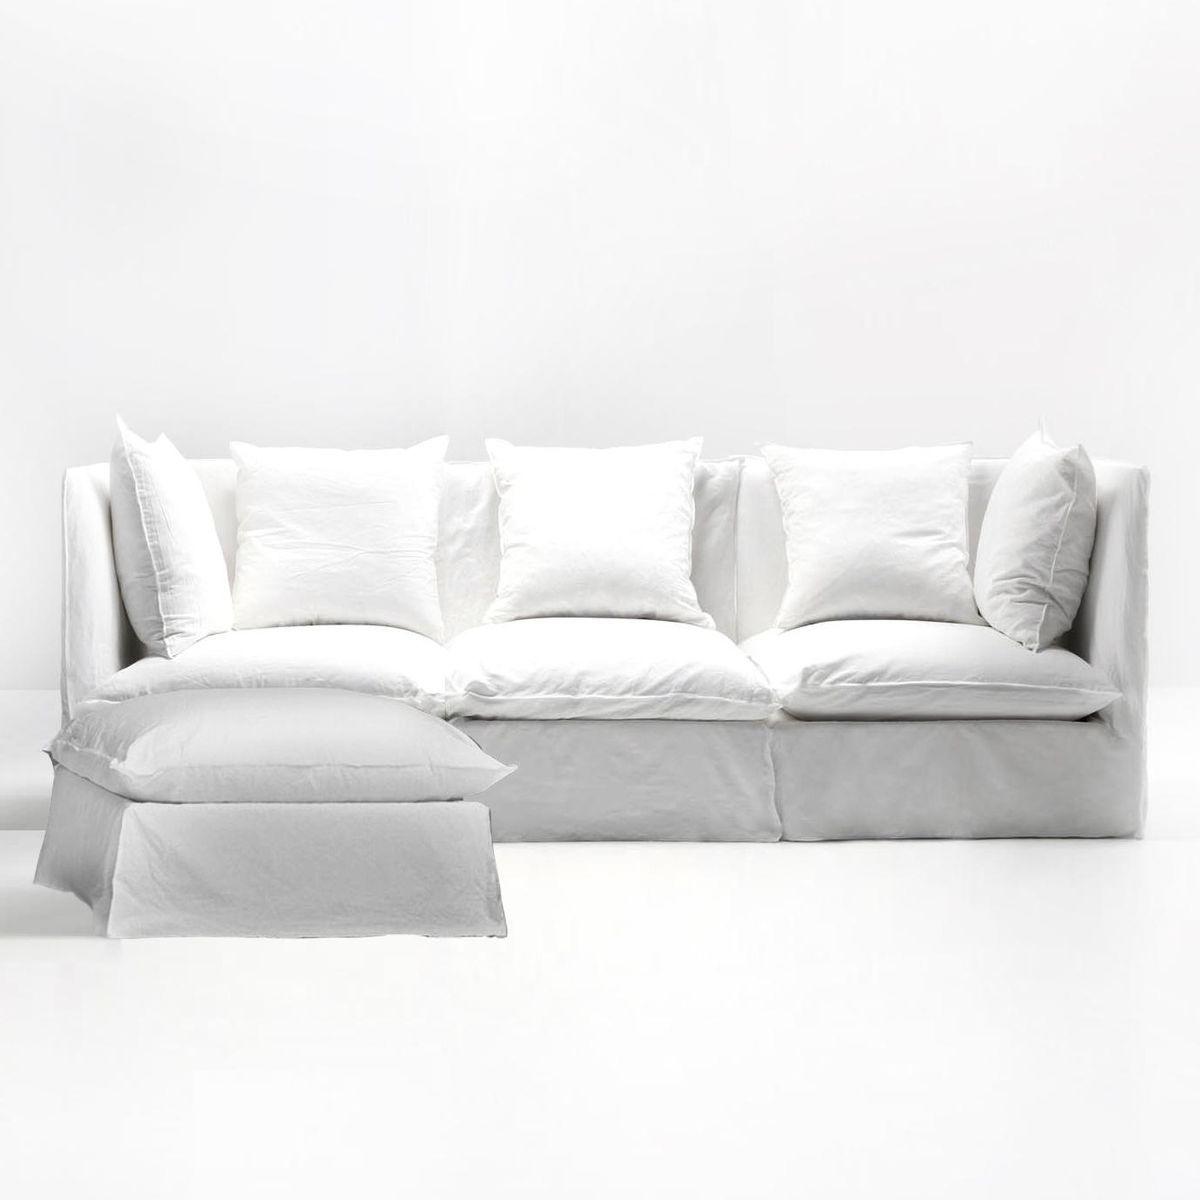 Ghost Sofa Ottoman Gervasoni Ghost Gervasoni Comfy Sofa Chair White Linen Sofa Ottoman Sofa